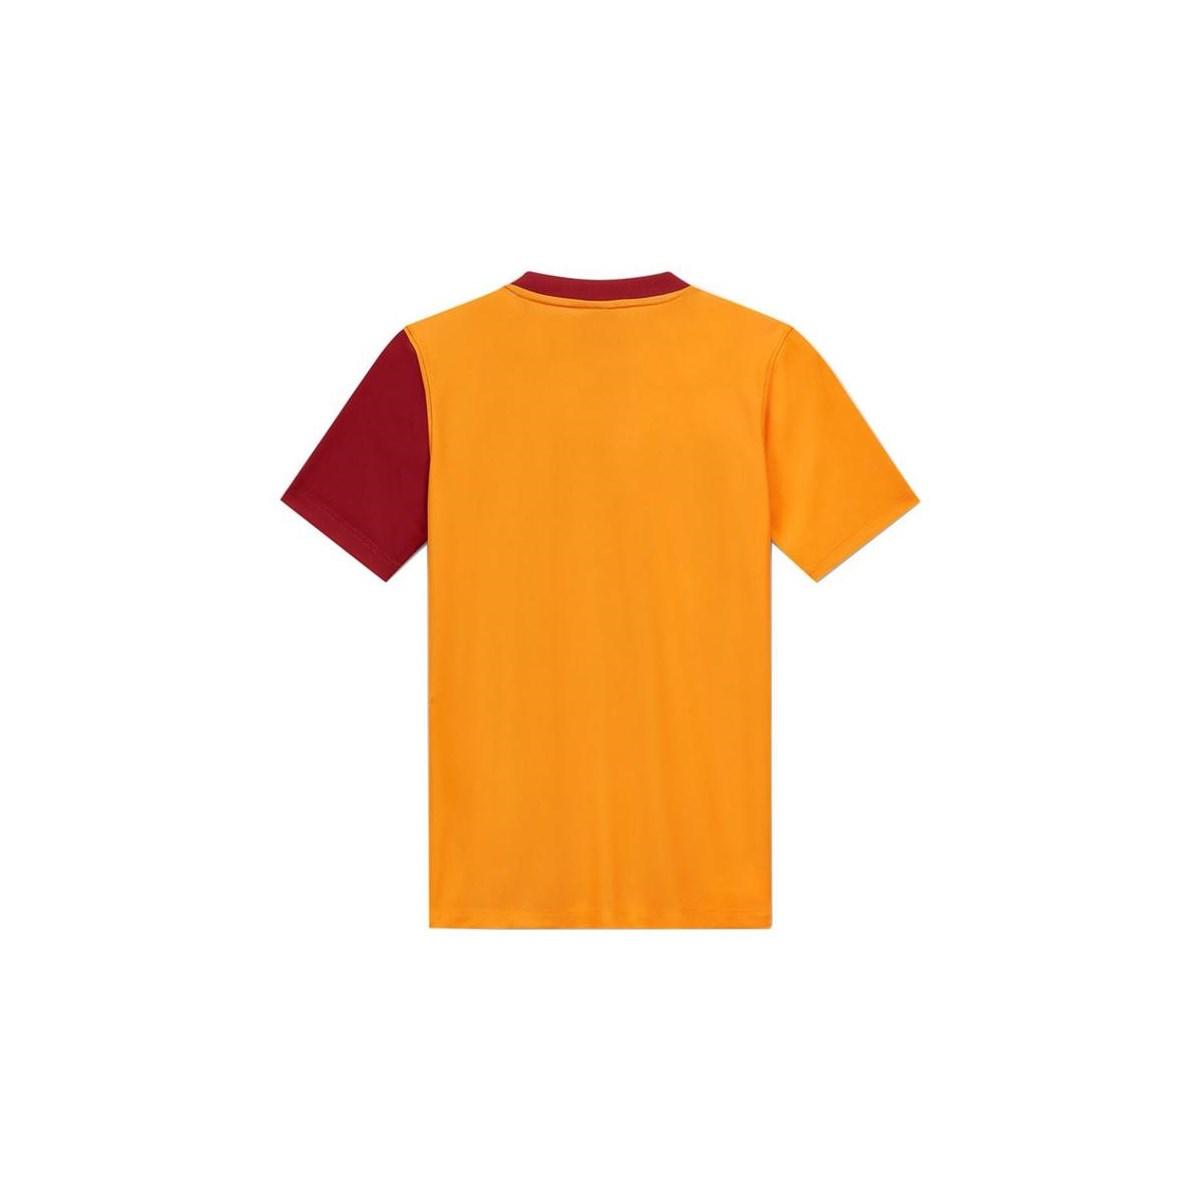 Galatasaray Çocuk Parçalı İç Saha Forma 2020-21